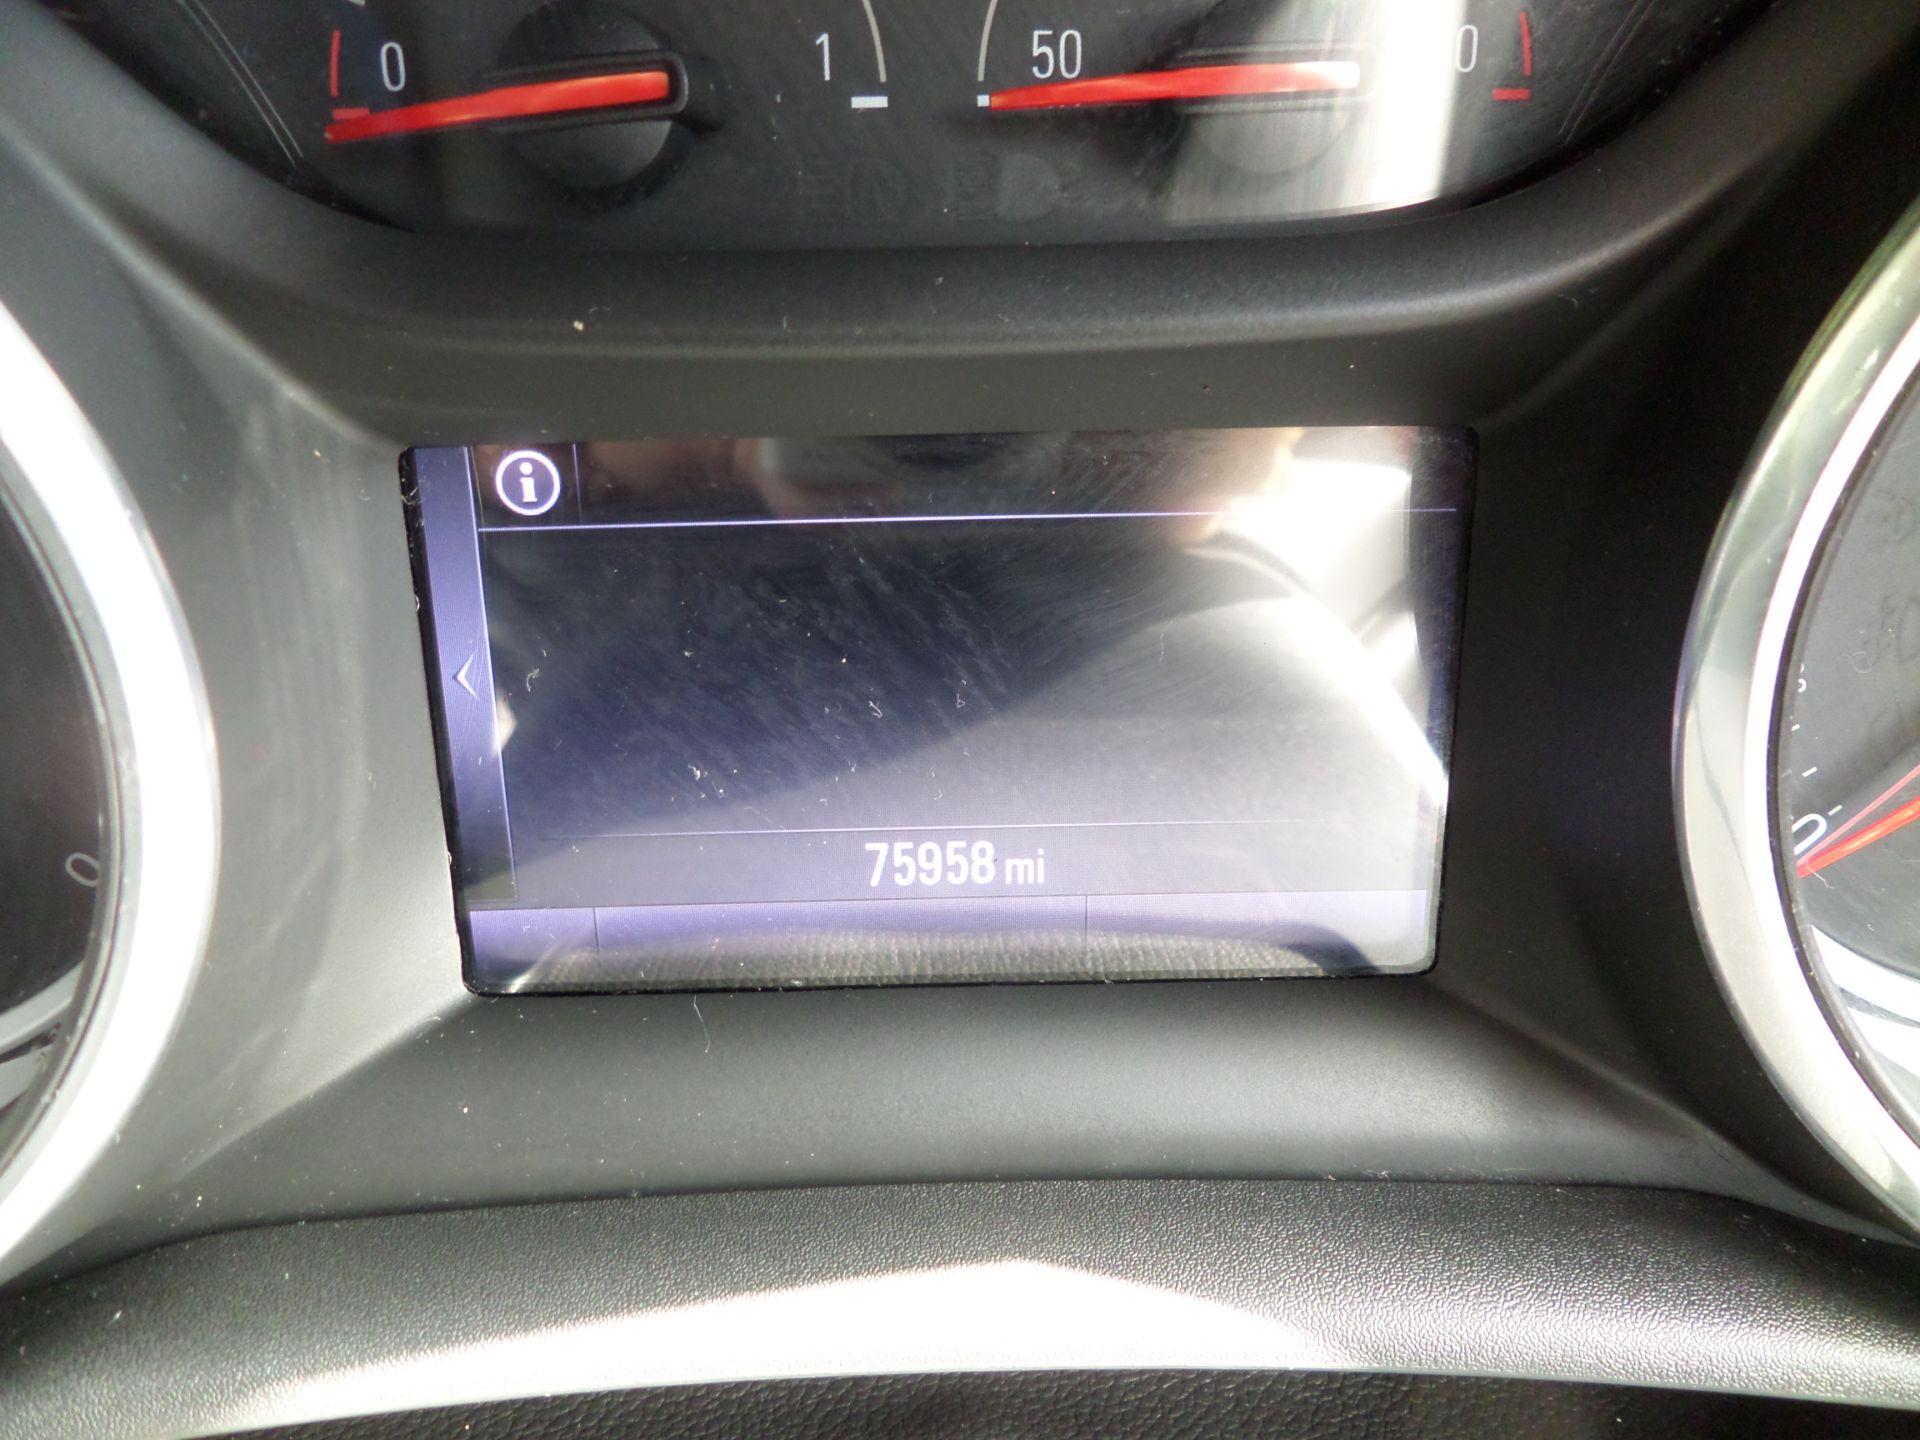 2018 Vauxhall Astra 1.6 Cdti 16V 136 Sri Nav 5Dr Euro 6 (DP18VCN) Image 15